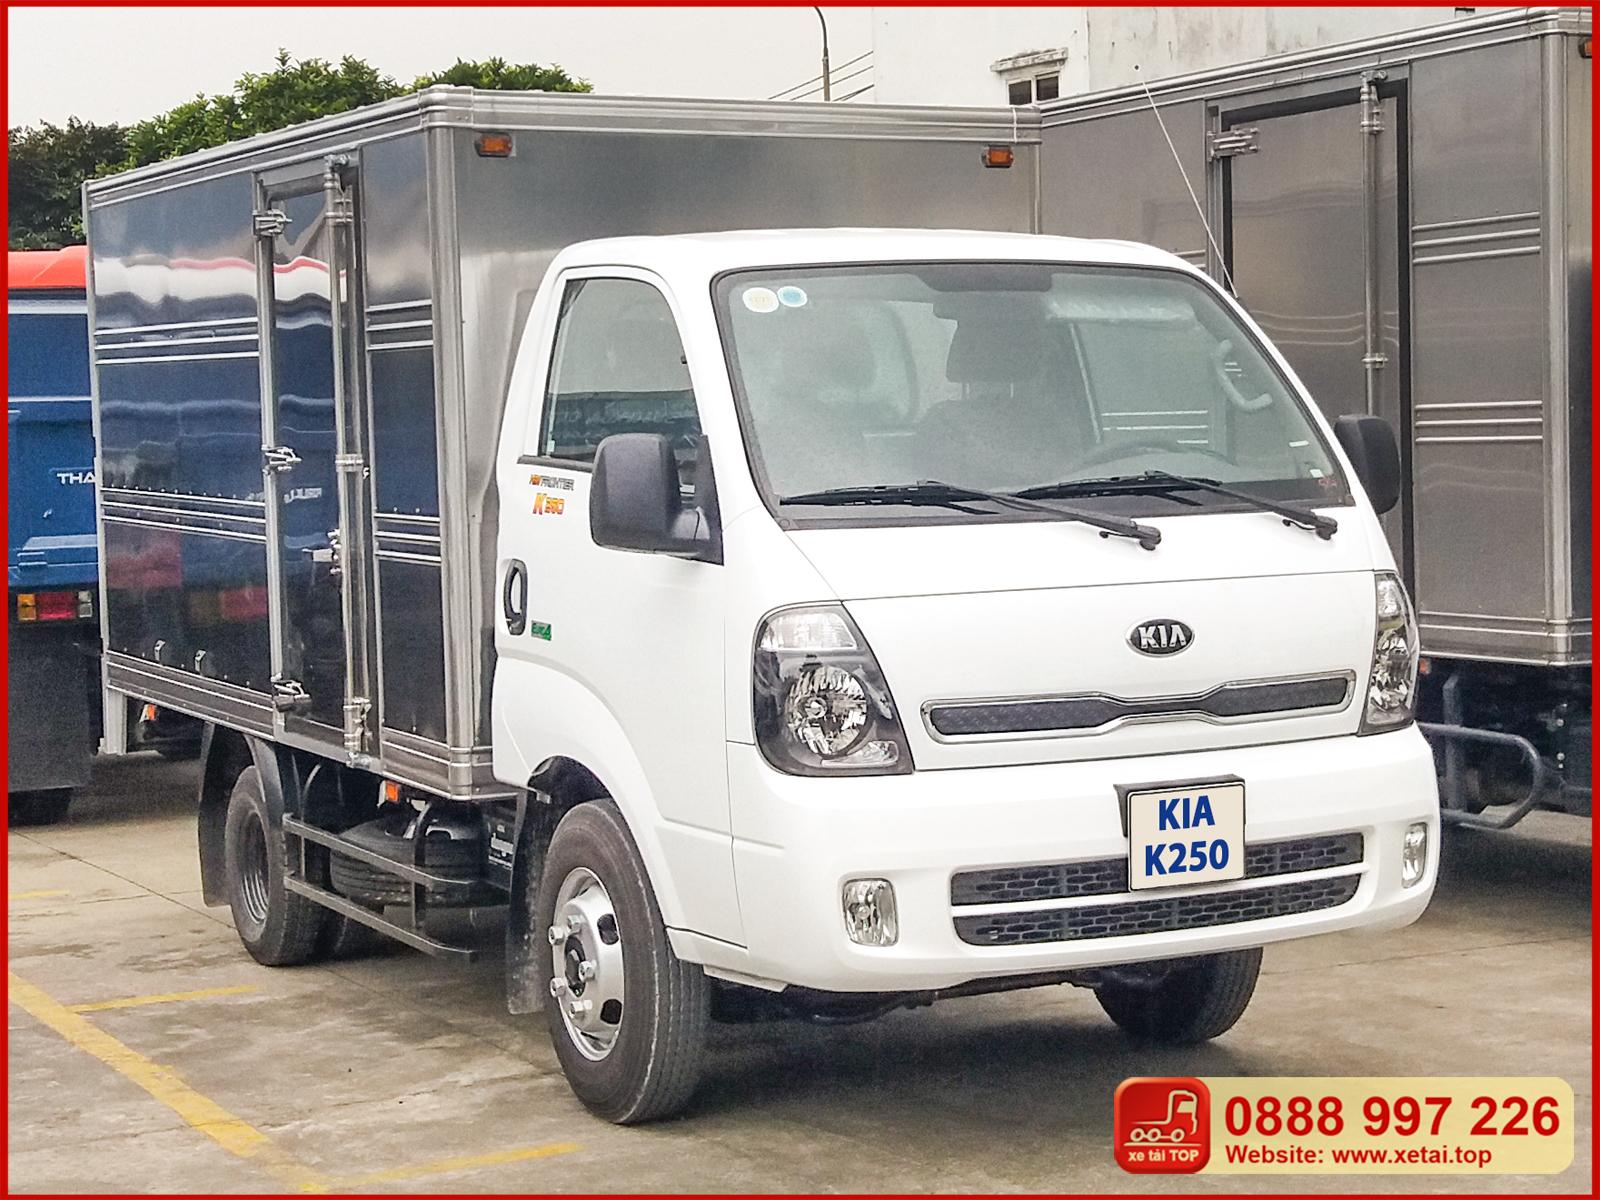 xe-tải-kia-thaco-k250-tải-trọng-2.4-tấn